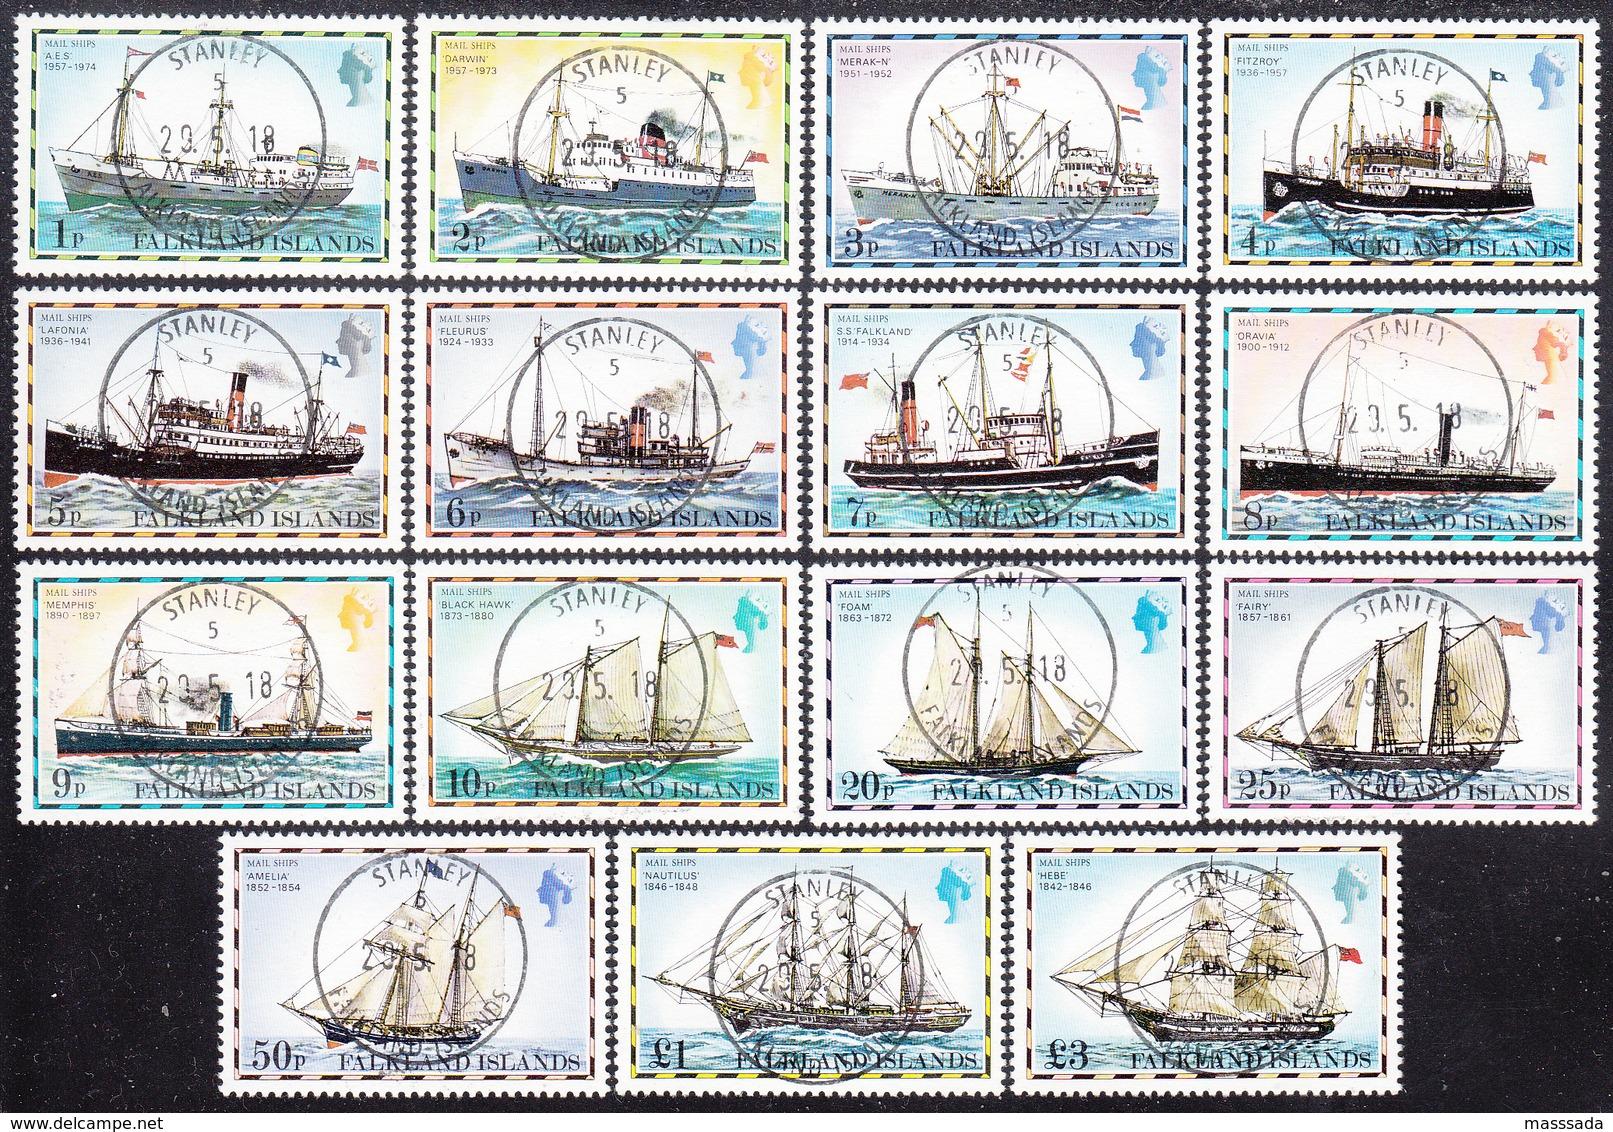 FALKLAND ISLANDS  Michel  255/69 I  Very Fine Used - Falkland